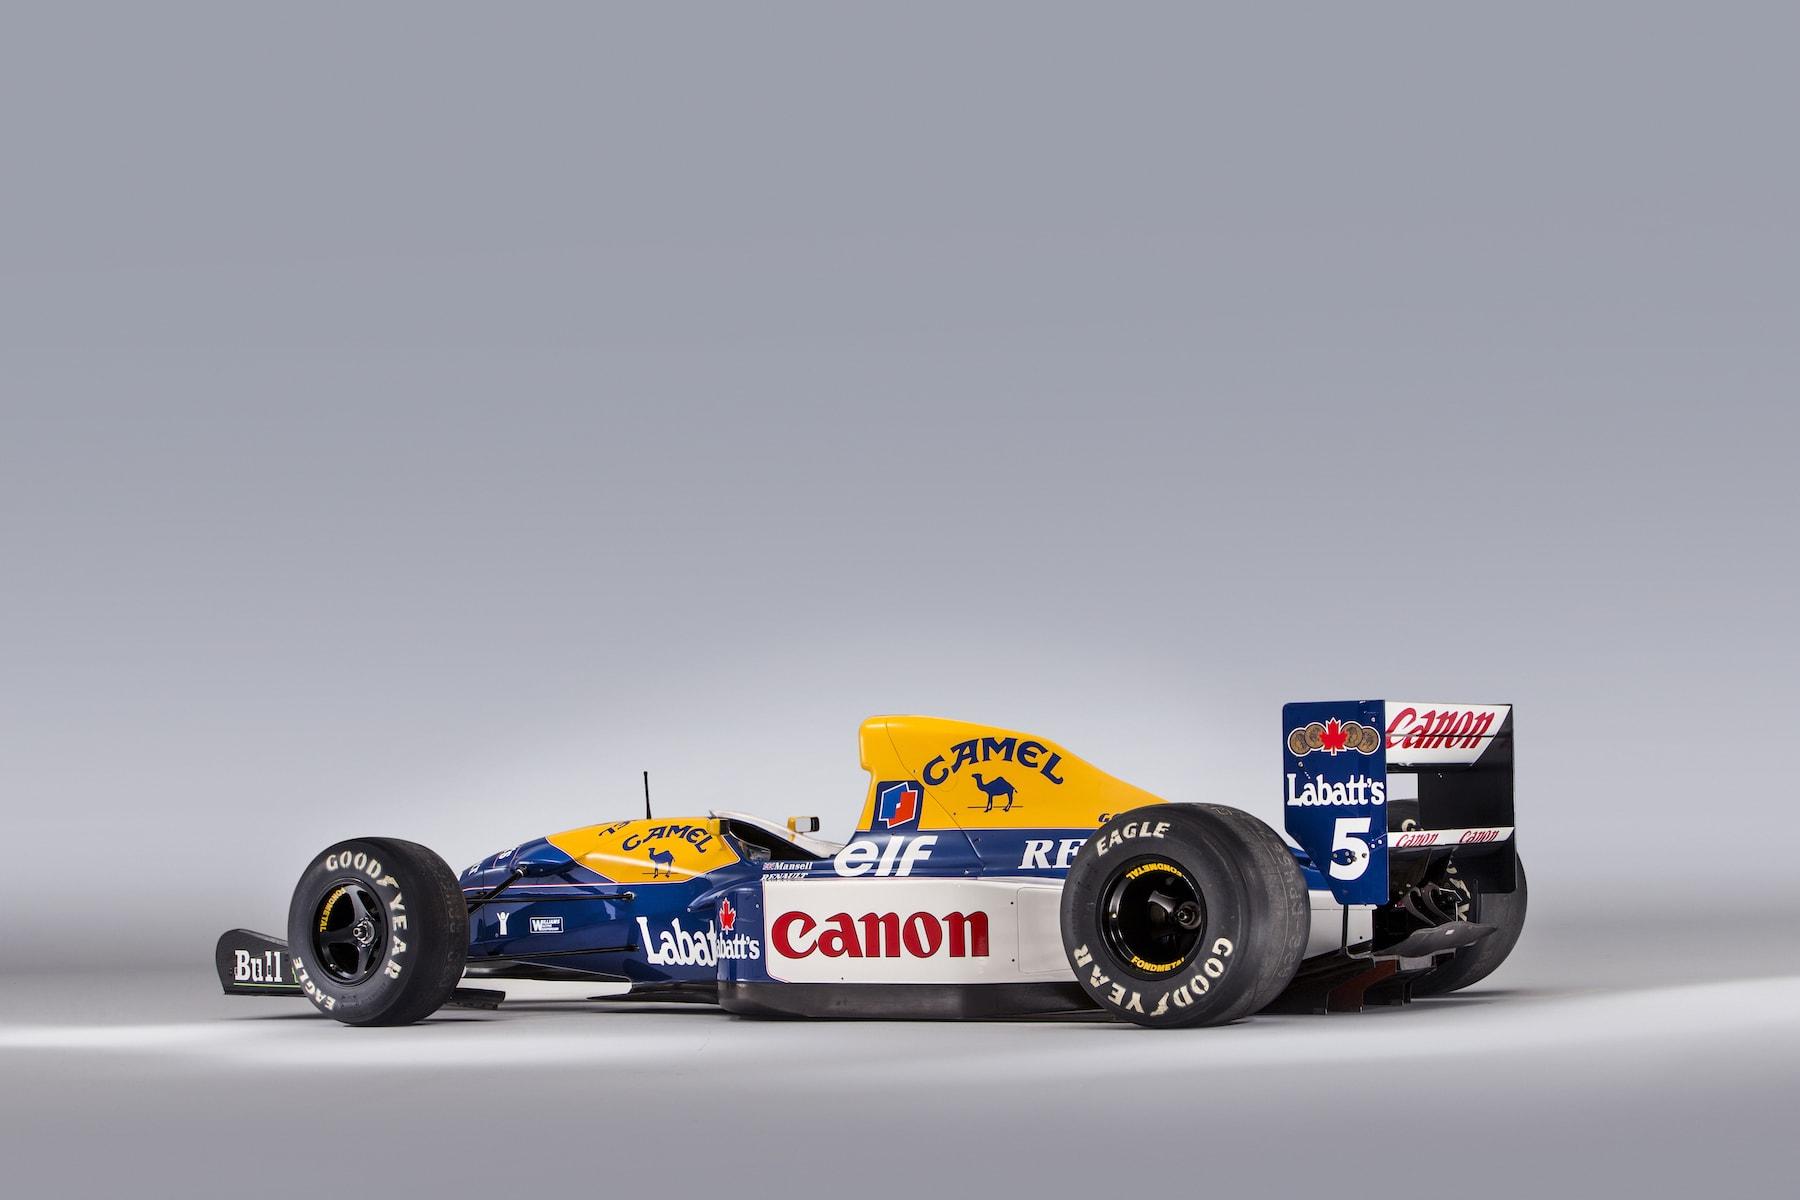 1992 Williams FW14B at Bonhams 2019 FoS 4 copy.jpg